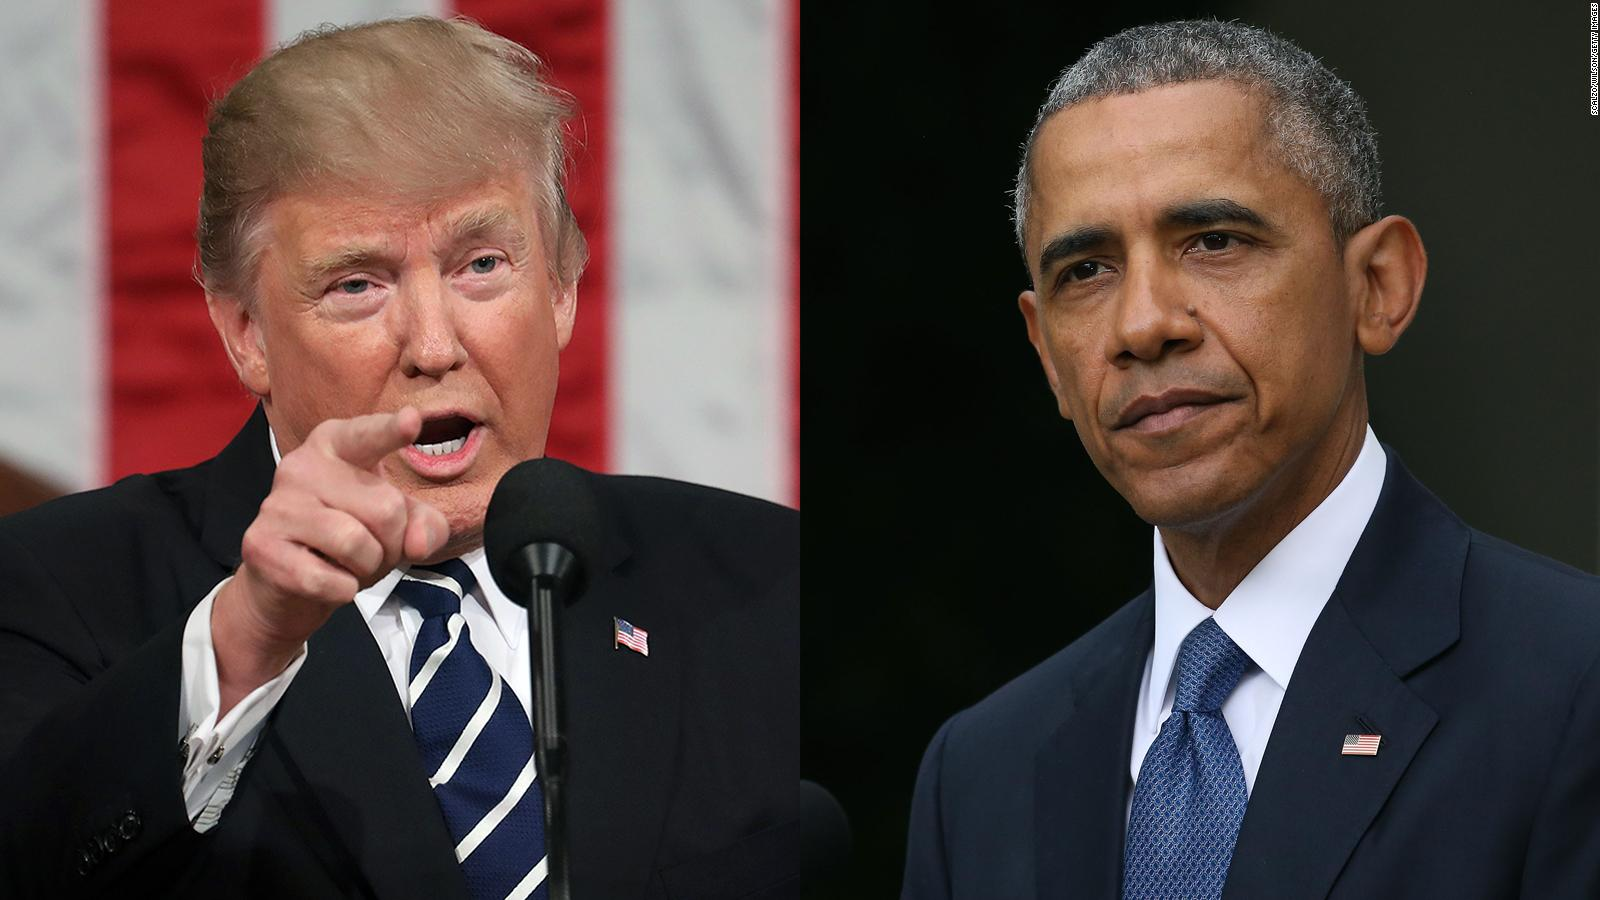 Donald Trump: Obama allowed Russia to seize the Crimea 08.03.2017 46